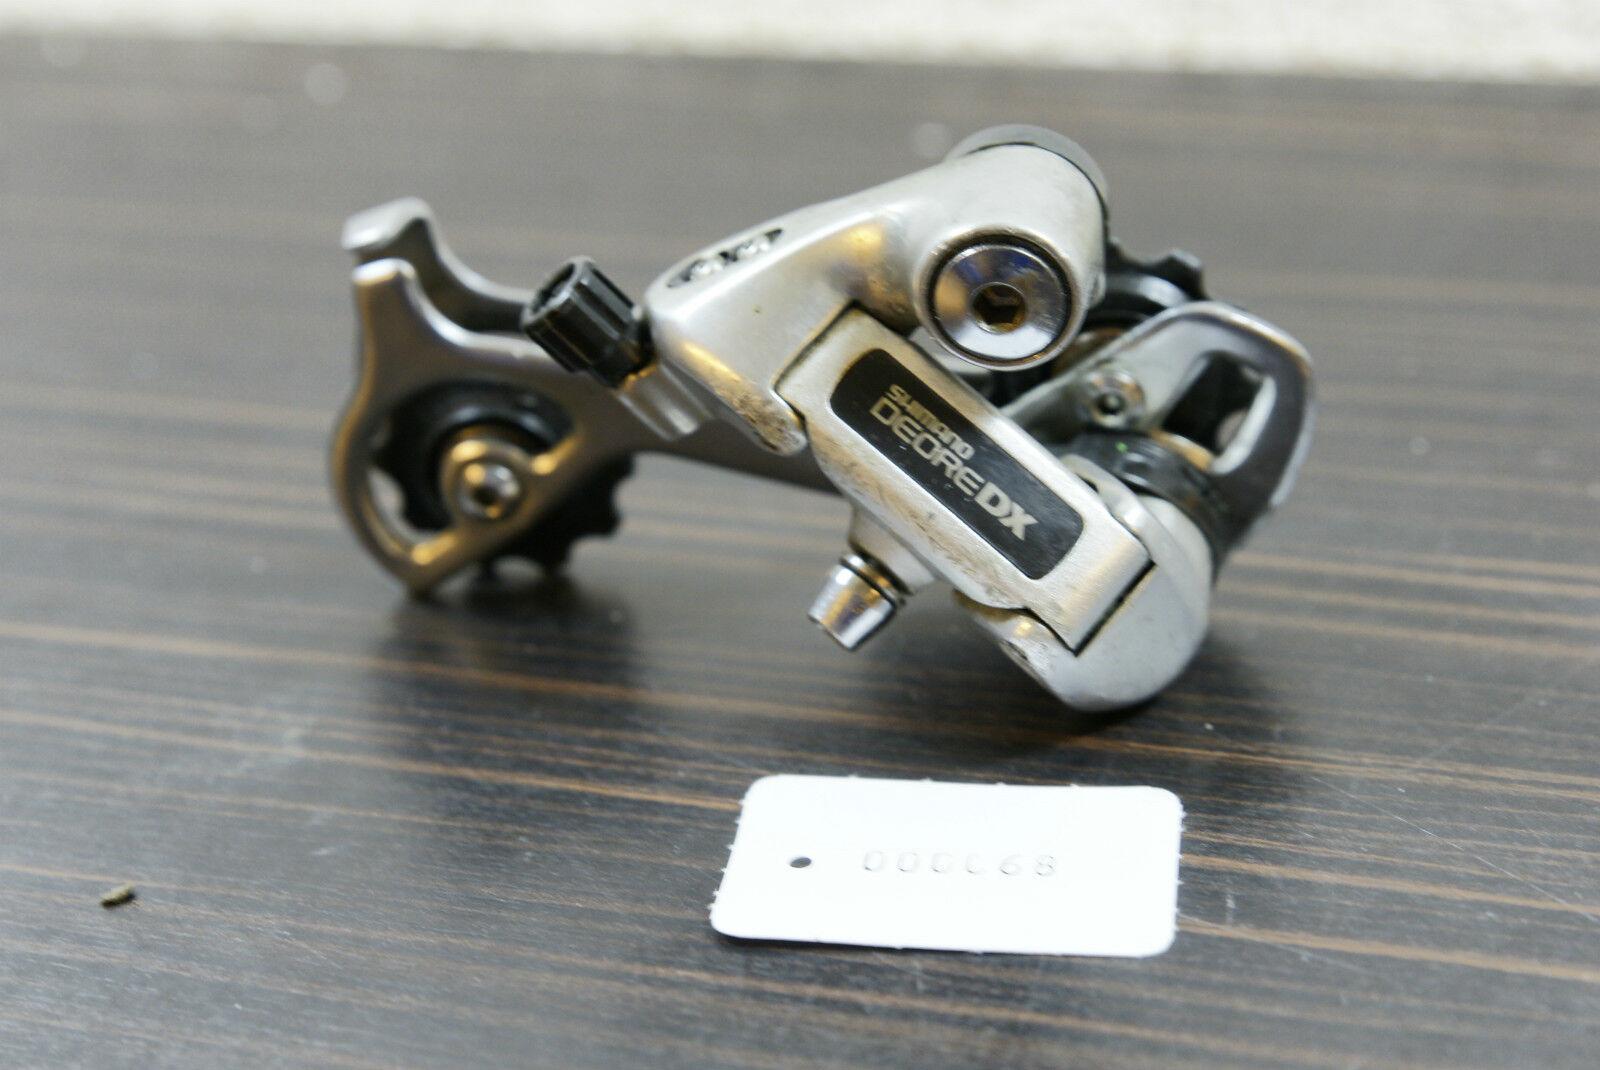 Shimano Deore DX RD-M650 Schaltwerk Kult Retro kurzer Käfig